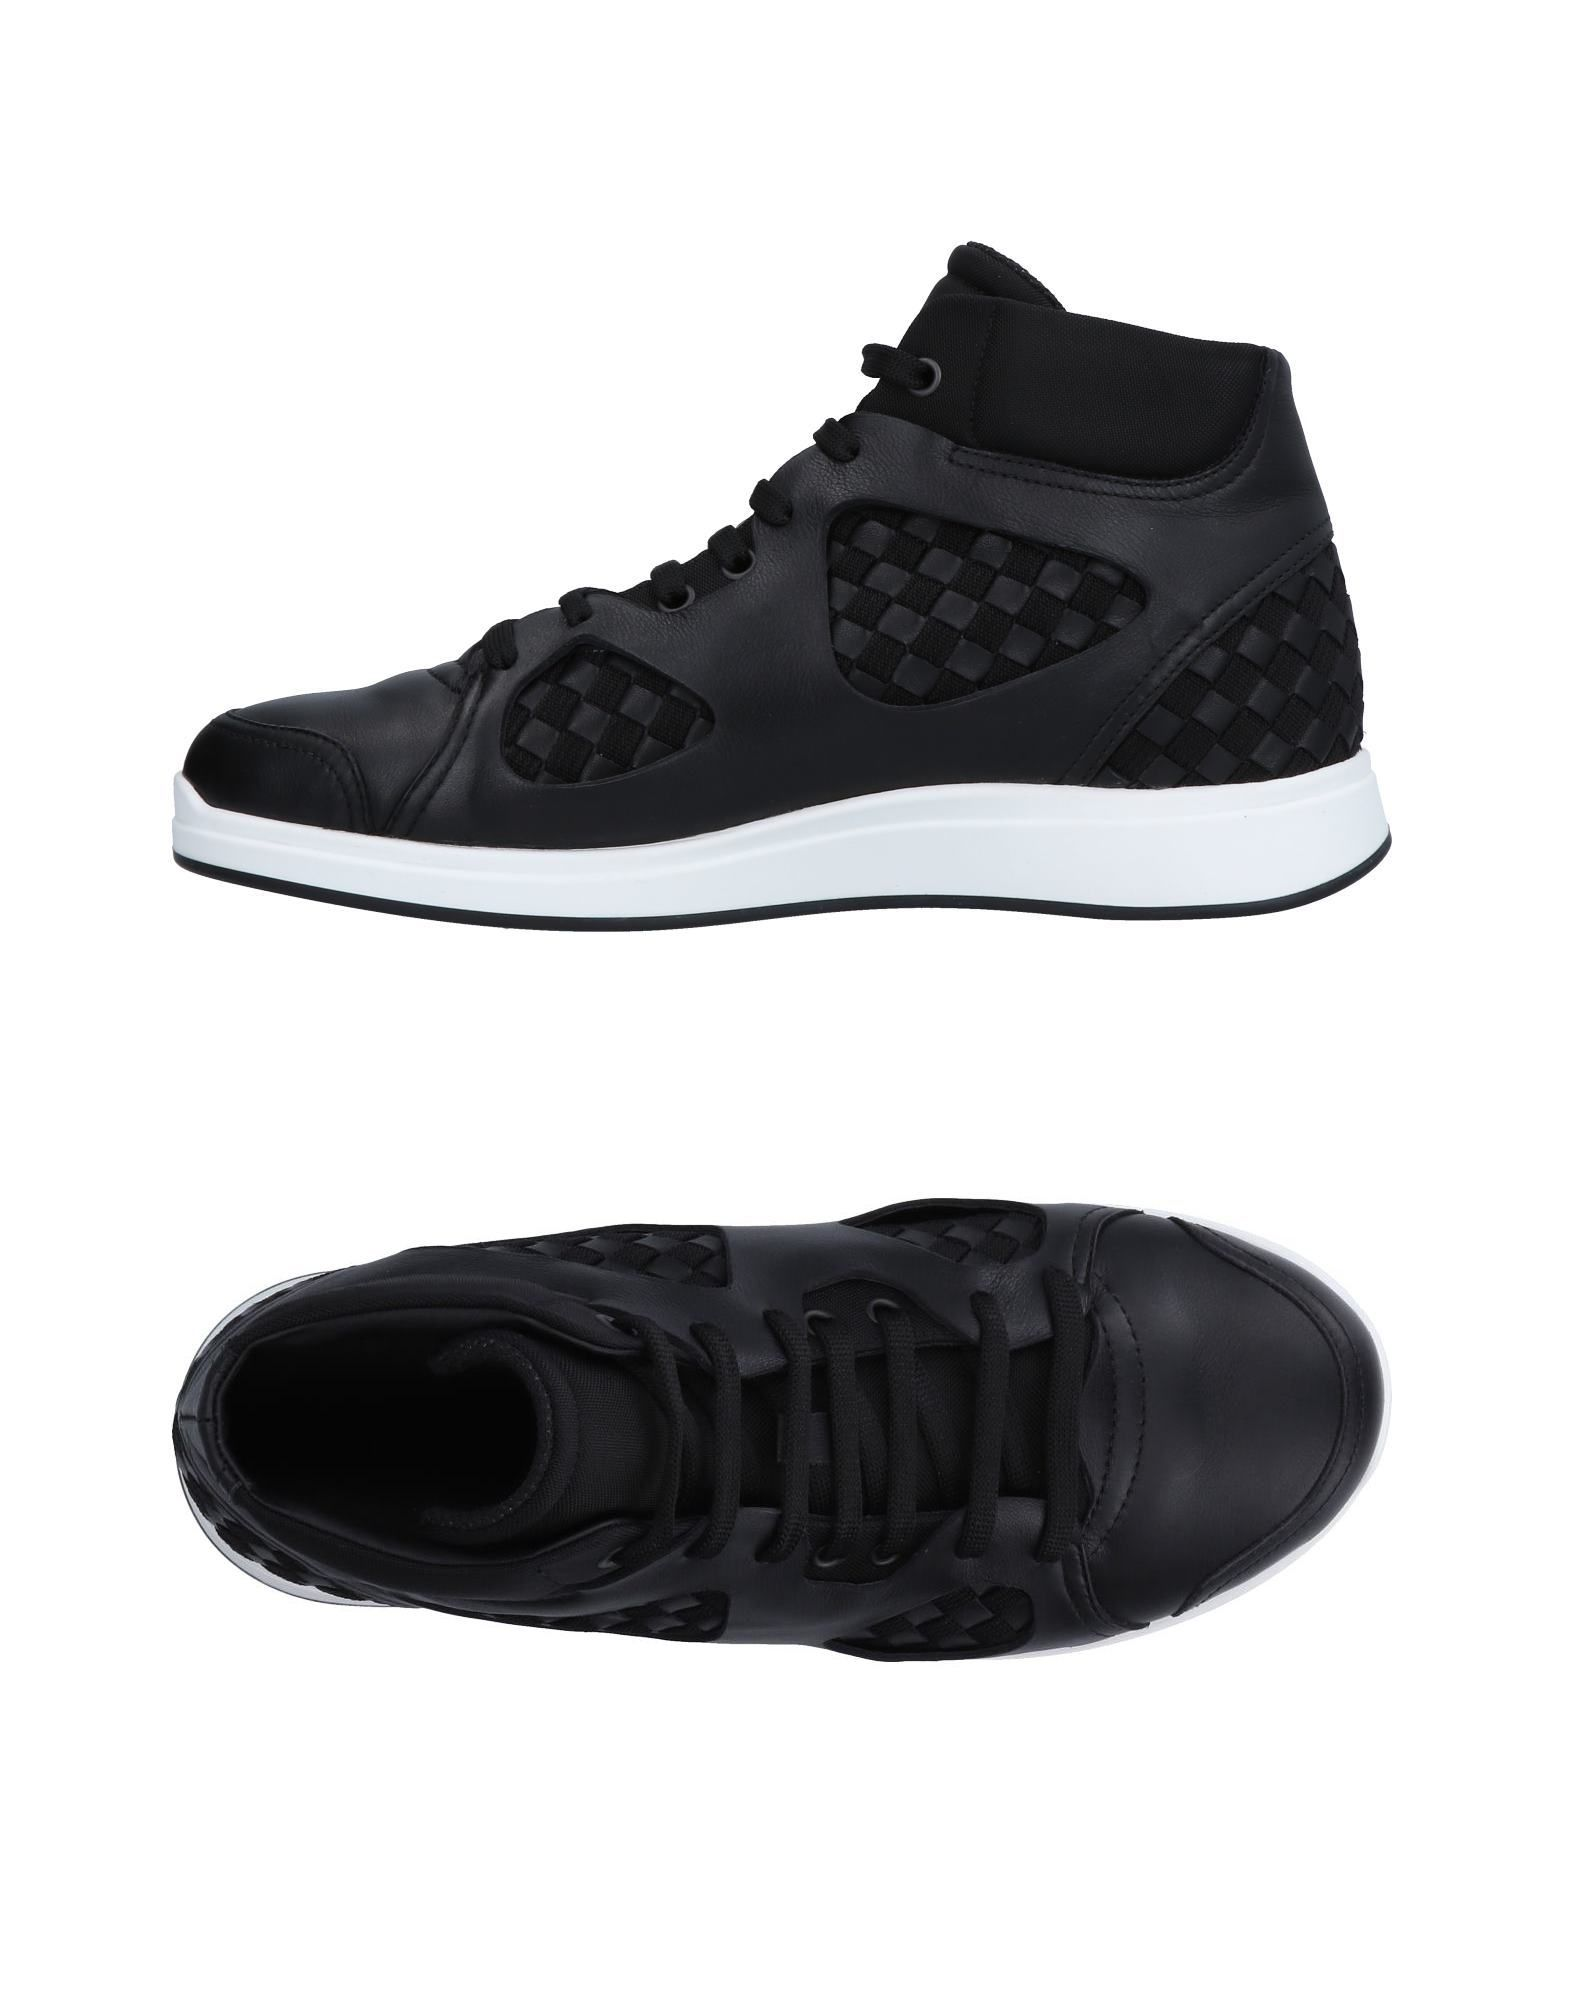 Bottega Veneta Sneakers Herren  11517054UF Gute Qualität beliebte Schuhe